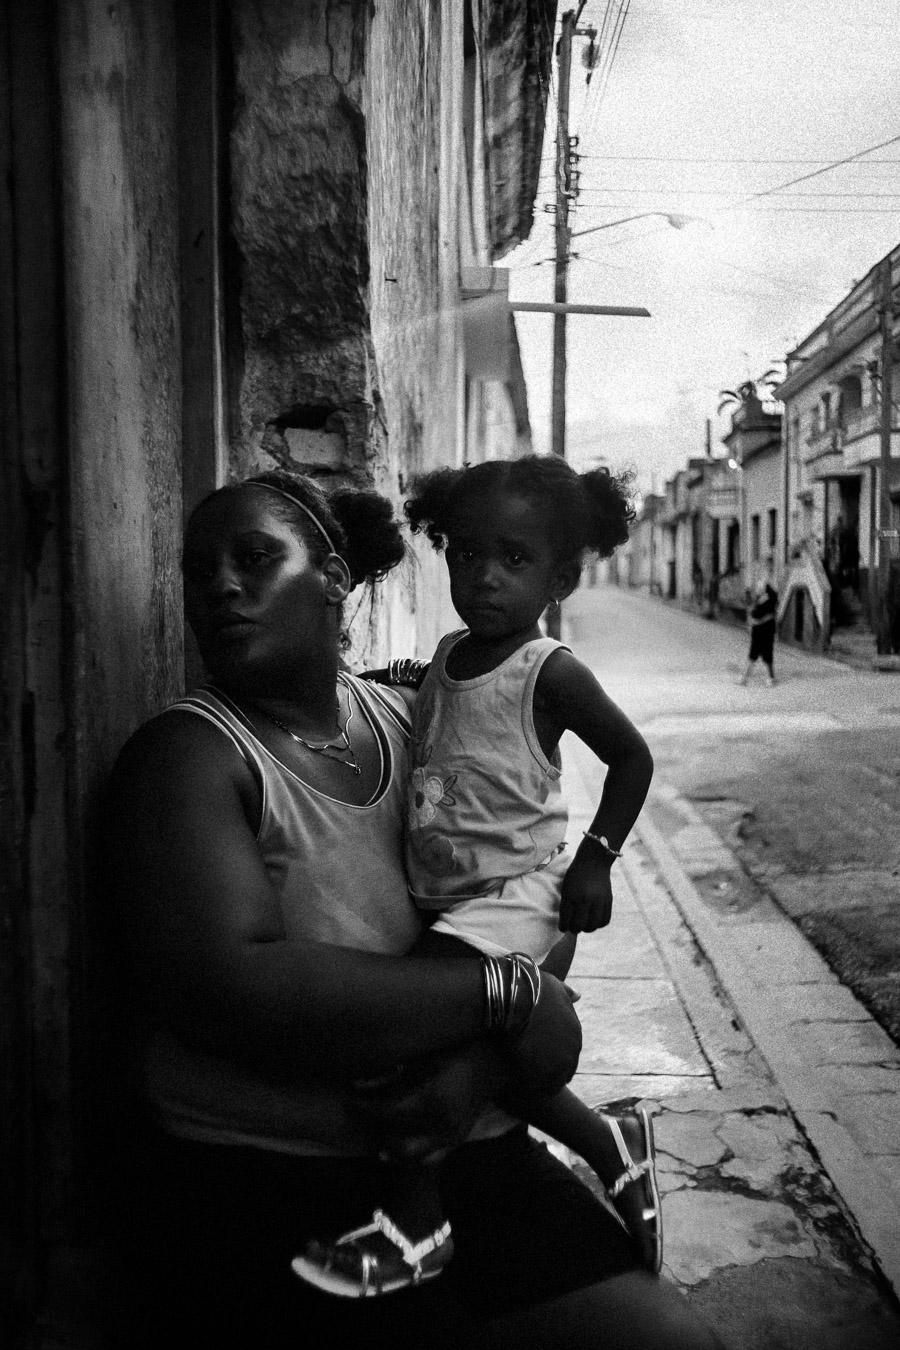 Kuba , Oktober 2016 - Matanzas_Antje_Kroeger_46